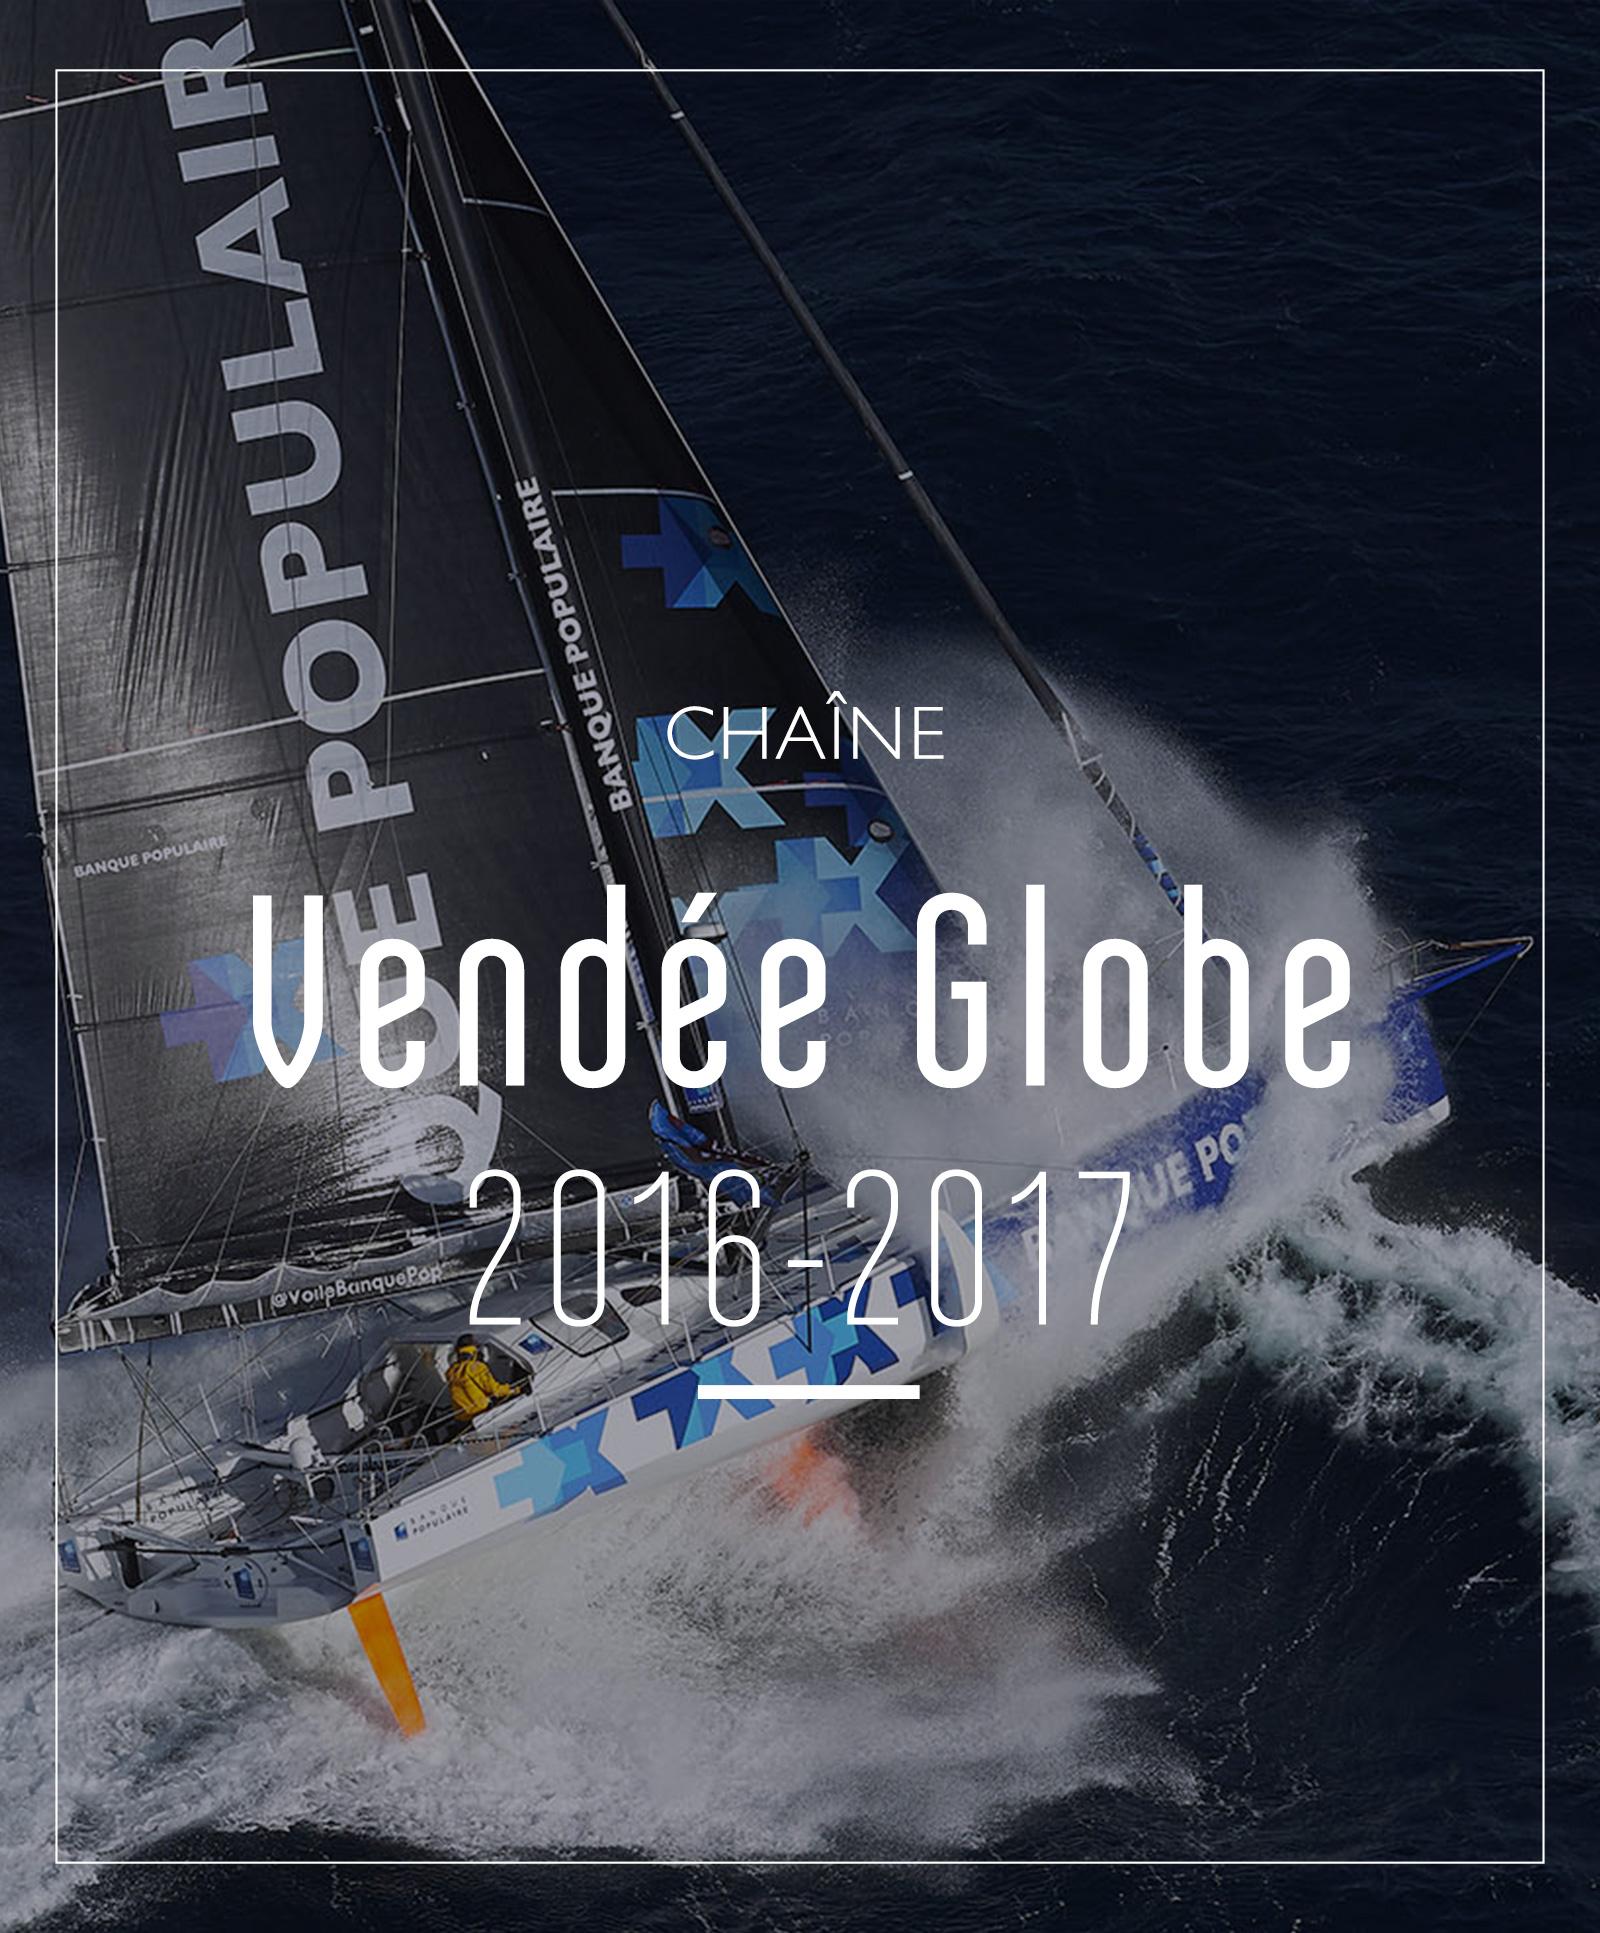 chaine Vendée Globe 2016-2017